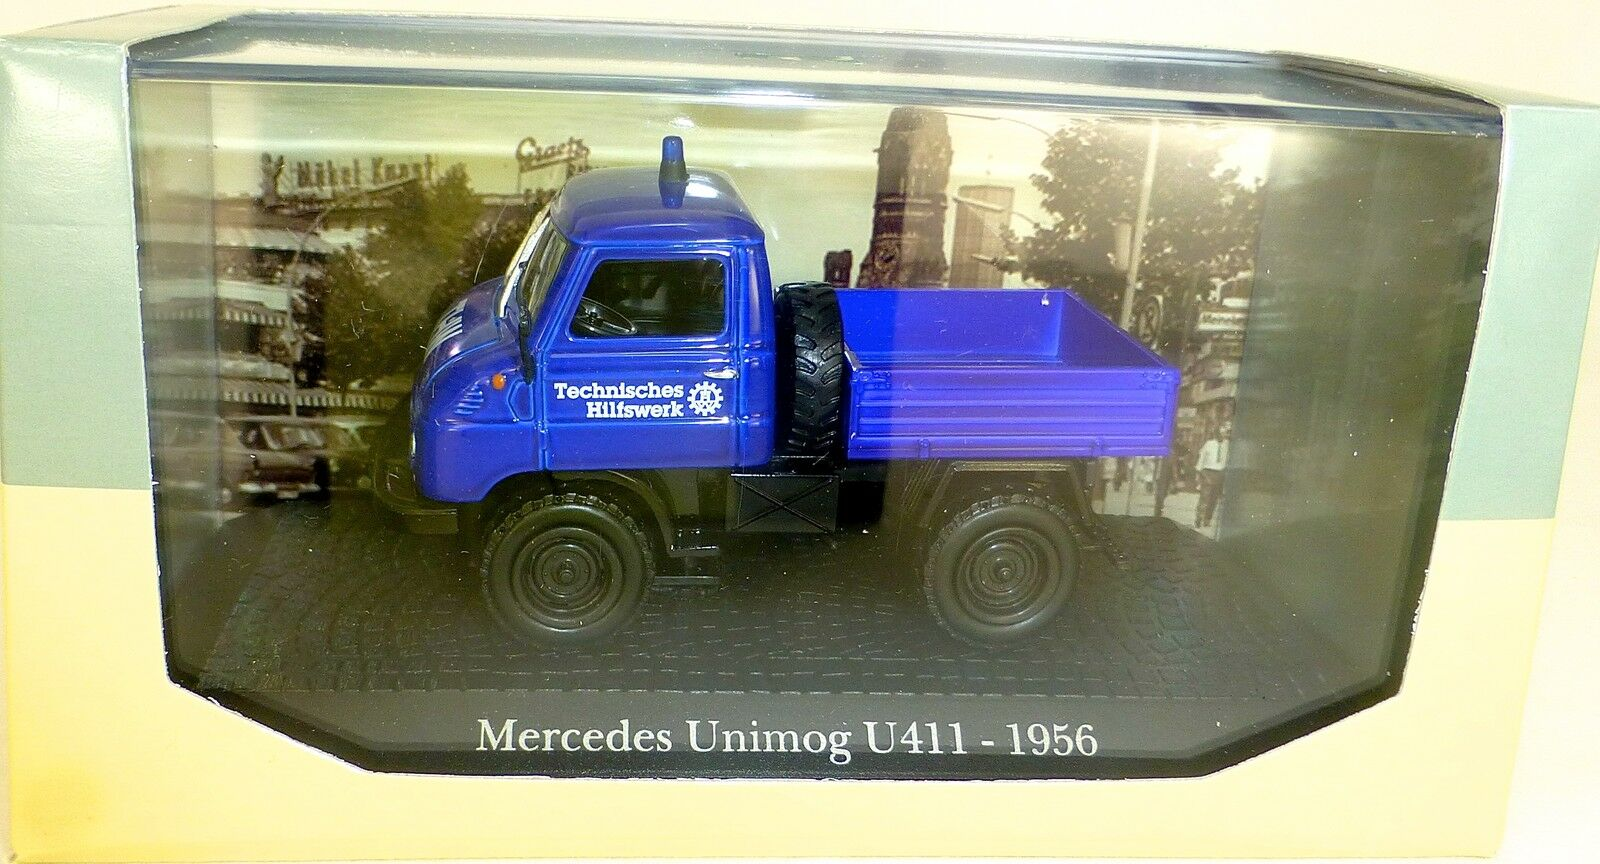 THW Unimog U411 1956 Mercedes 1 43 Atlas 7421125 New in Box LG6 Μ